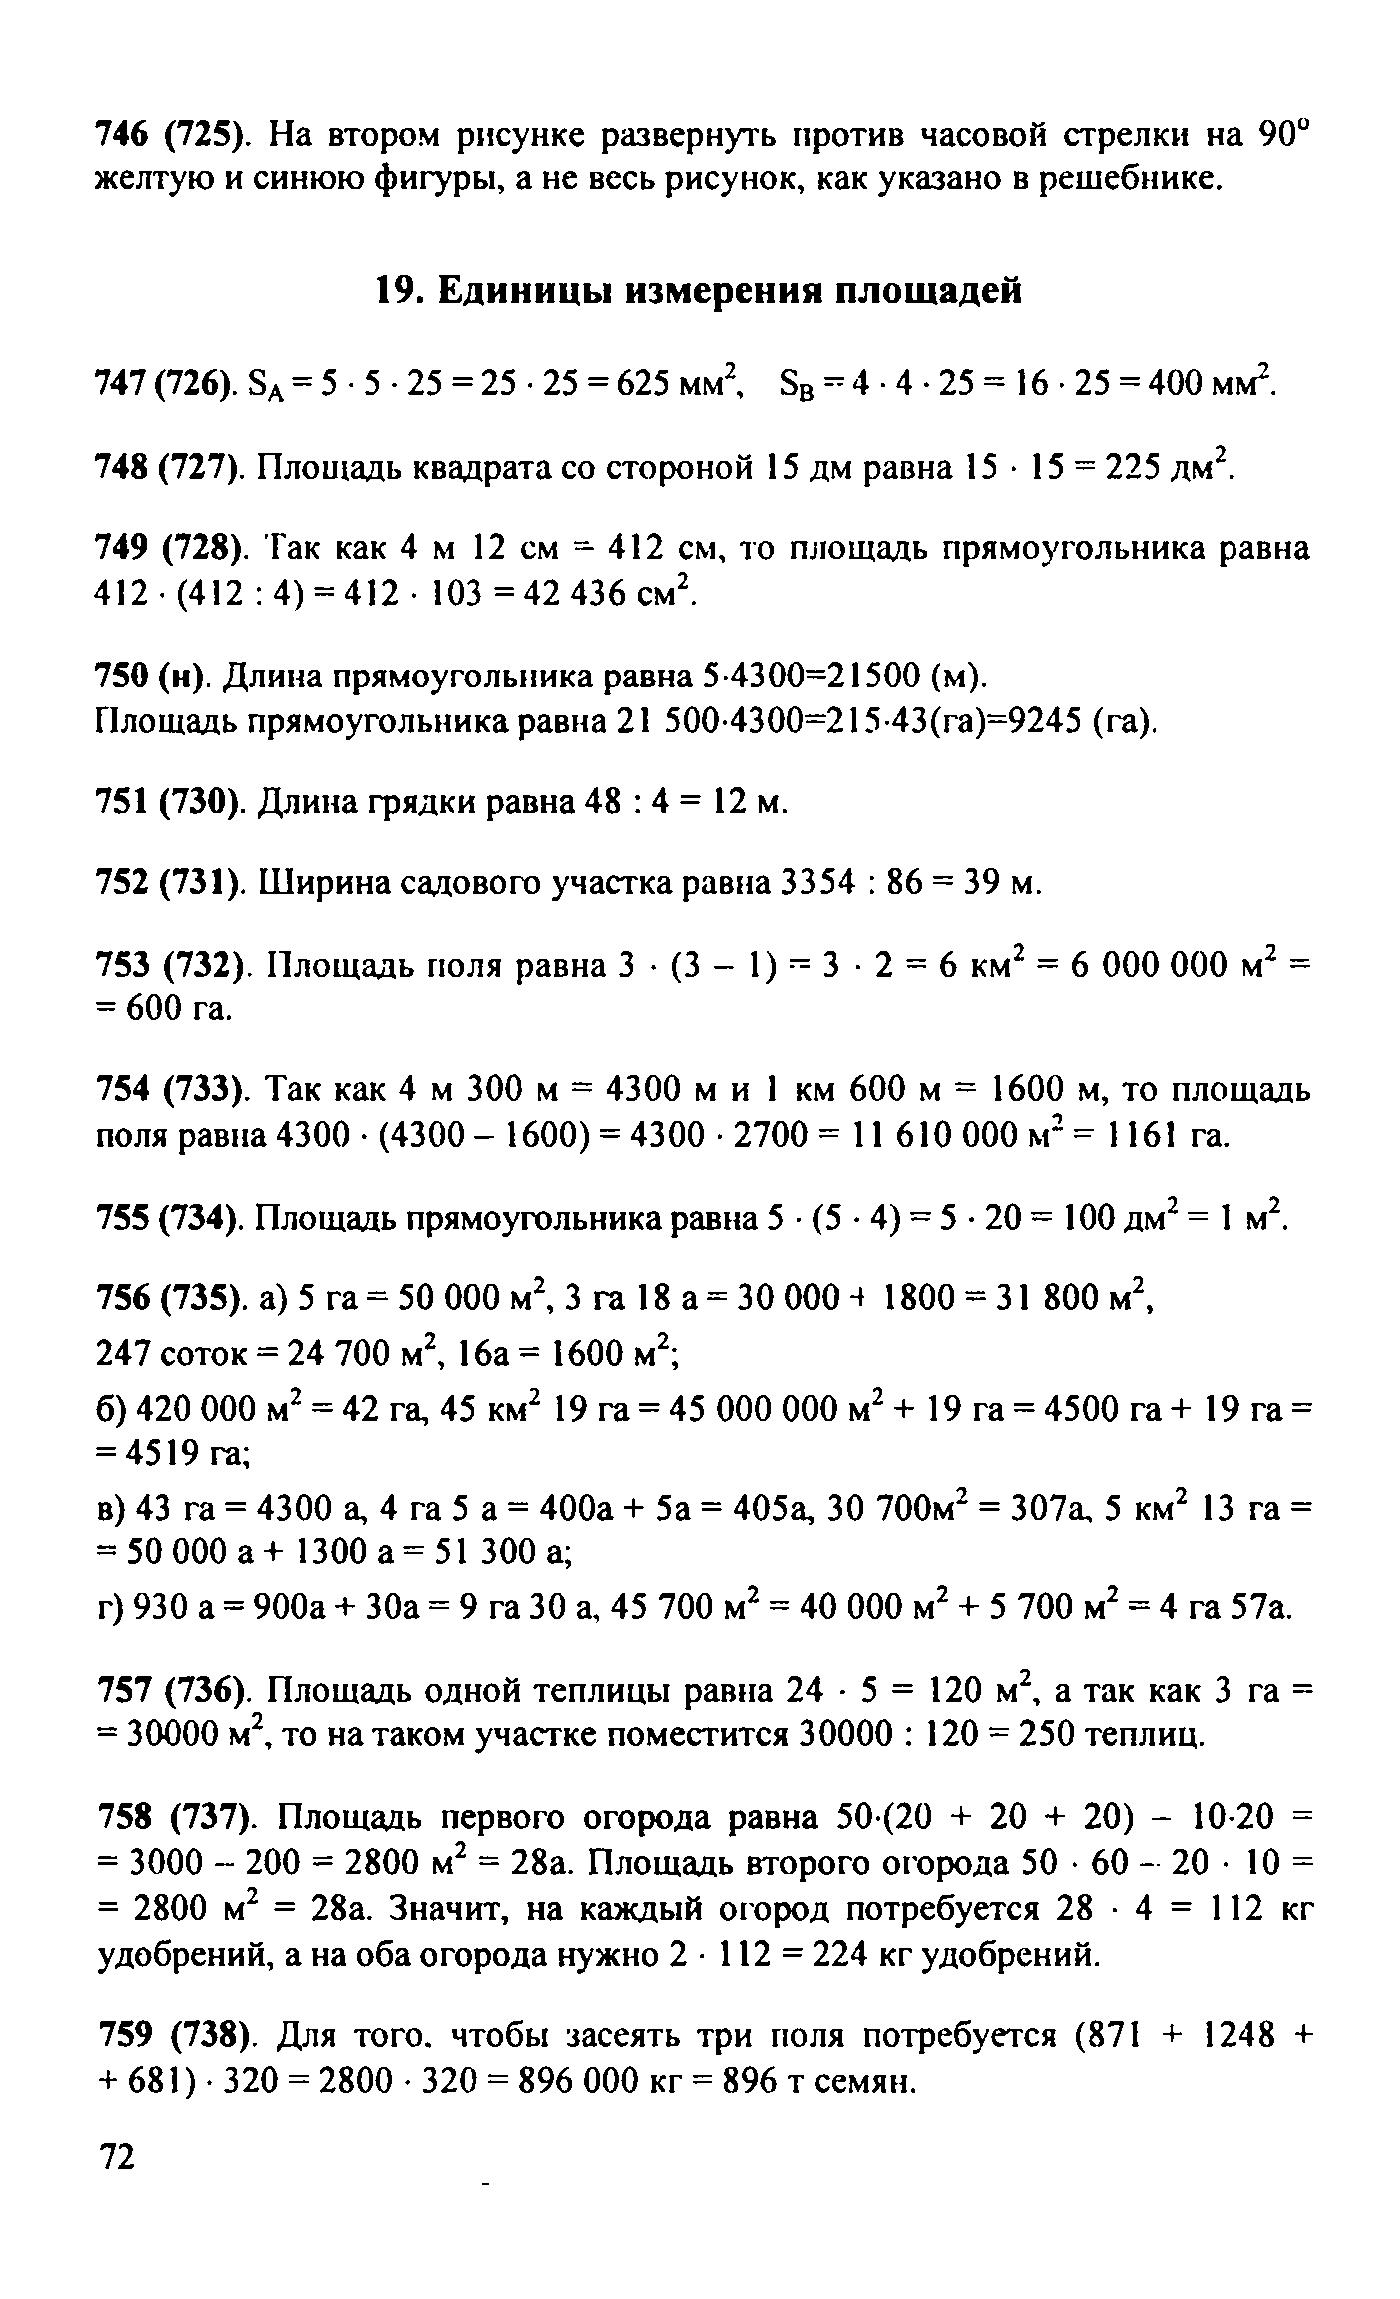 Гдз по математике 5 класс виленкин жохов чесноков шварцбурд спиши.ру